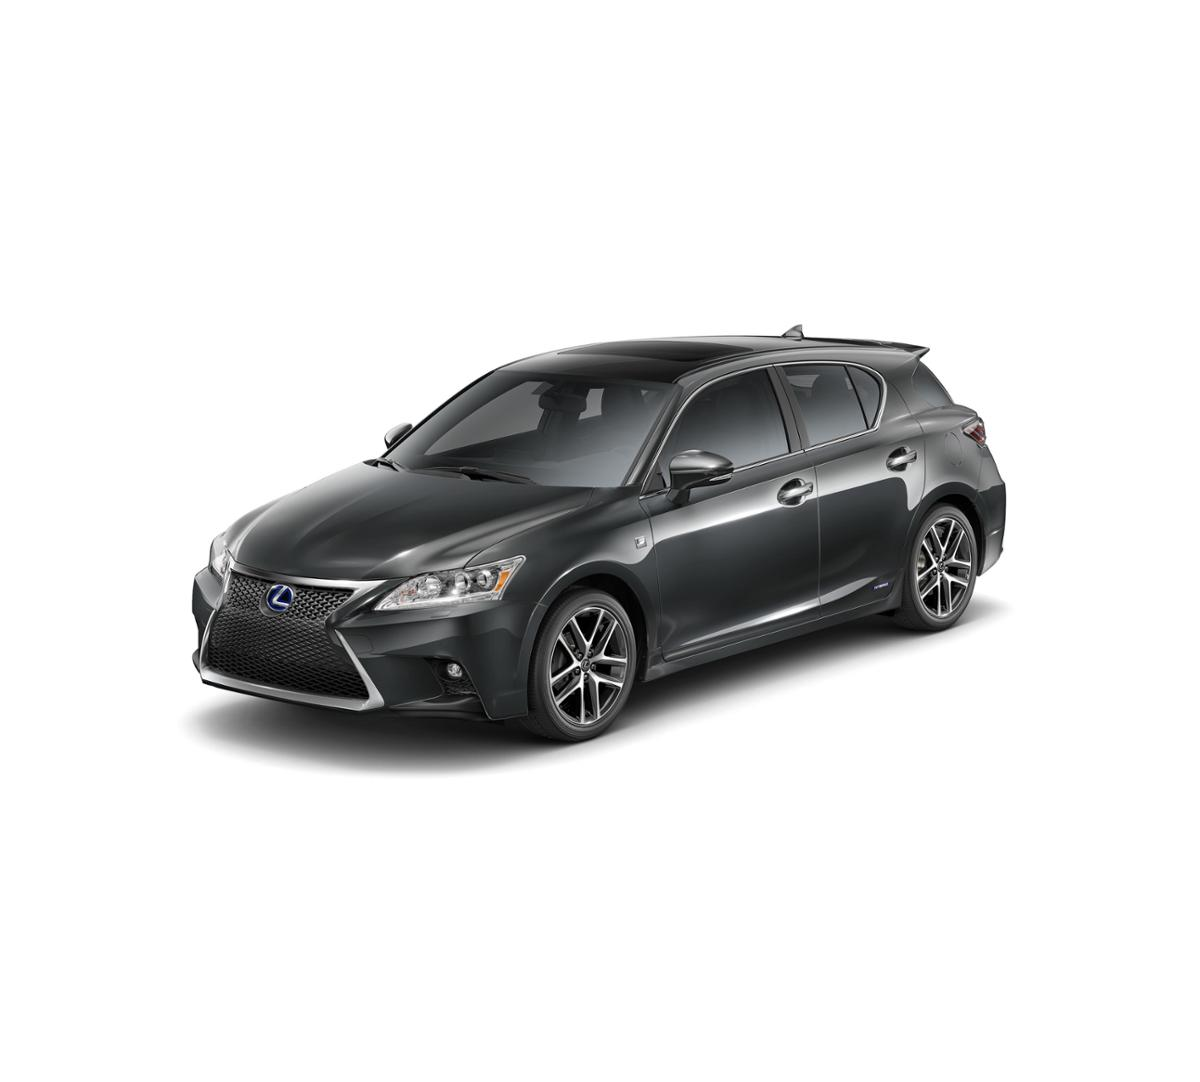 Lexus Dealerships In Ct: Modesto Nebula Gray Pearl 2017 Lexus CT 200h: New Car For